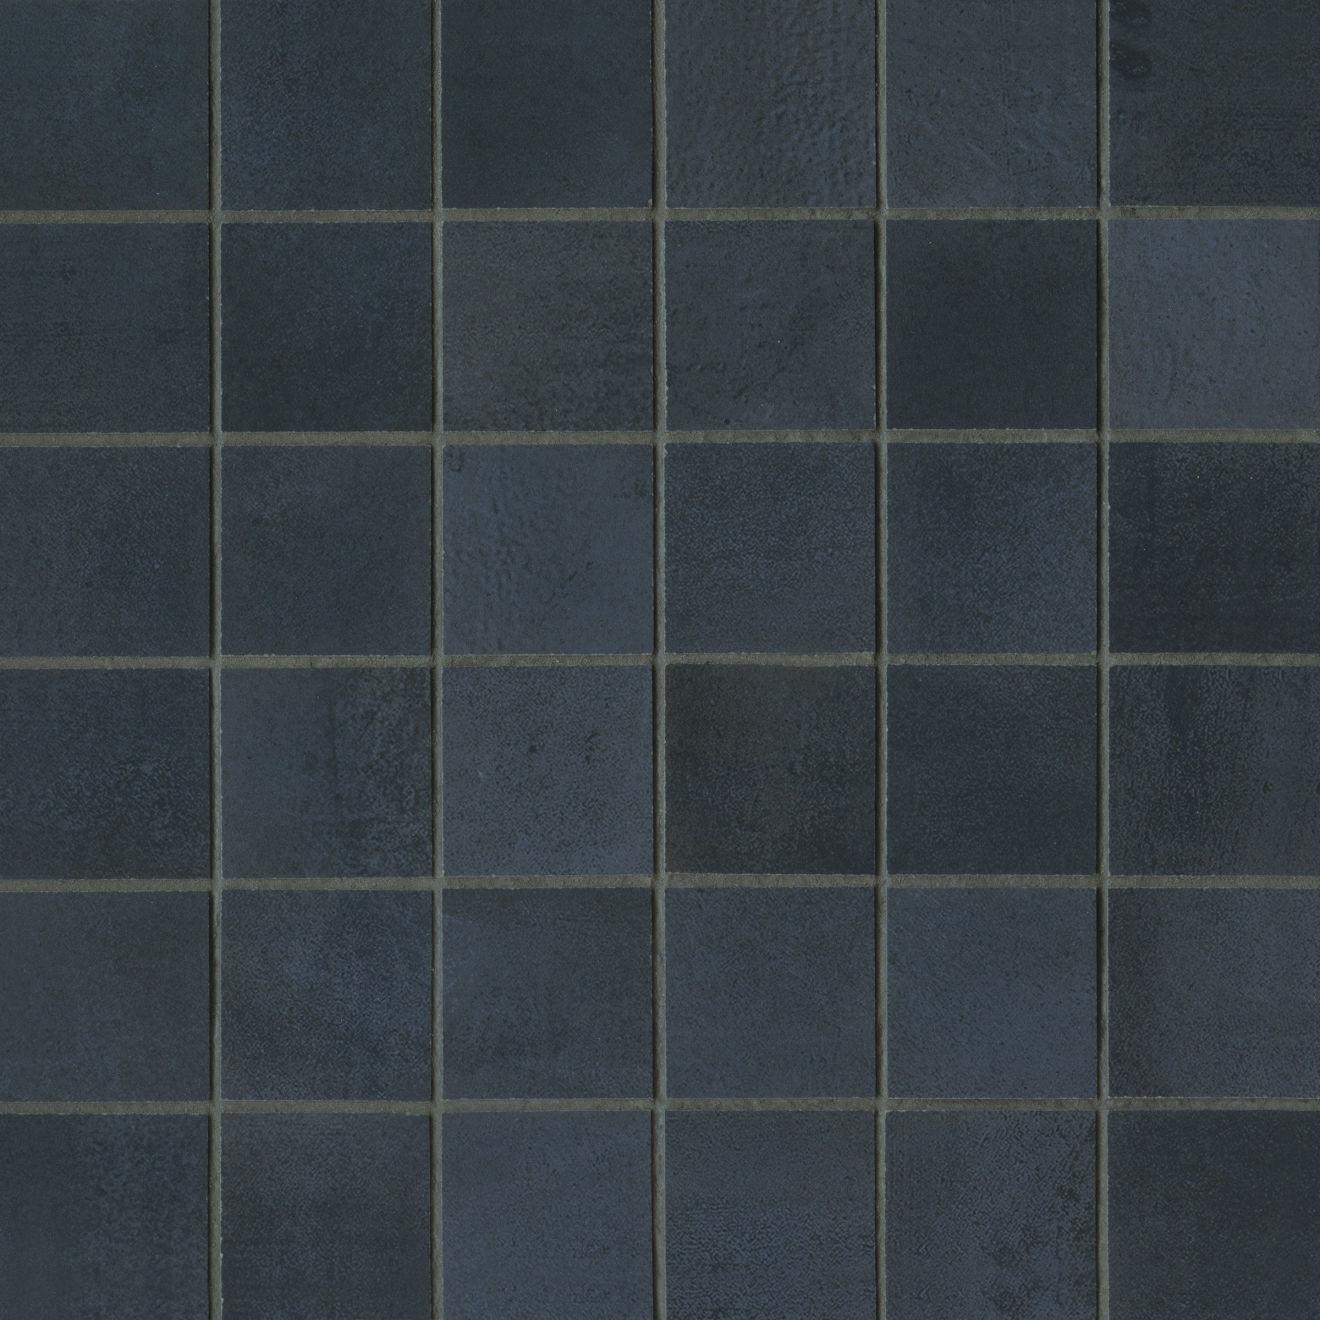 "Chateau 2"" x 2"" Floor & Wall Mosaic in Ocean"